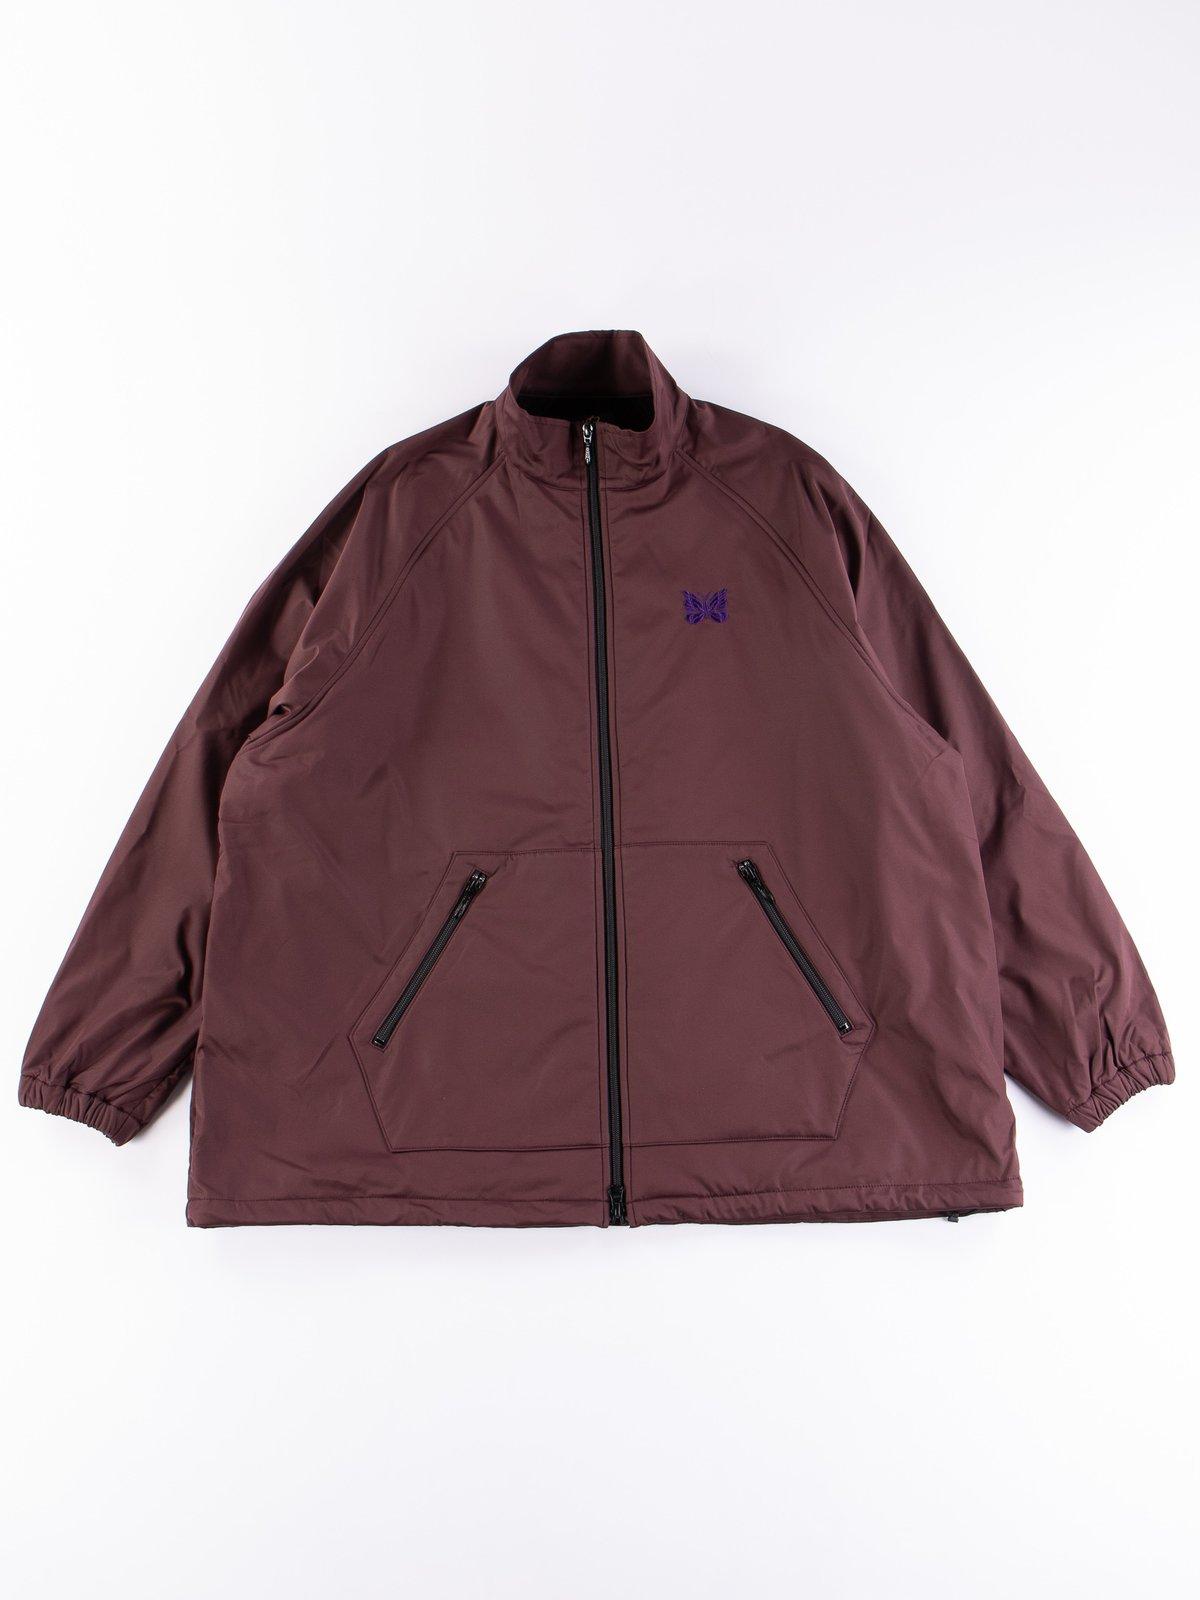 Bordeaux Jog Jacket - Image 1